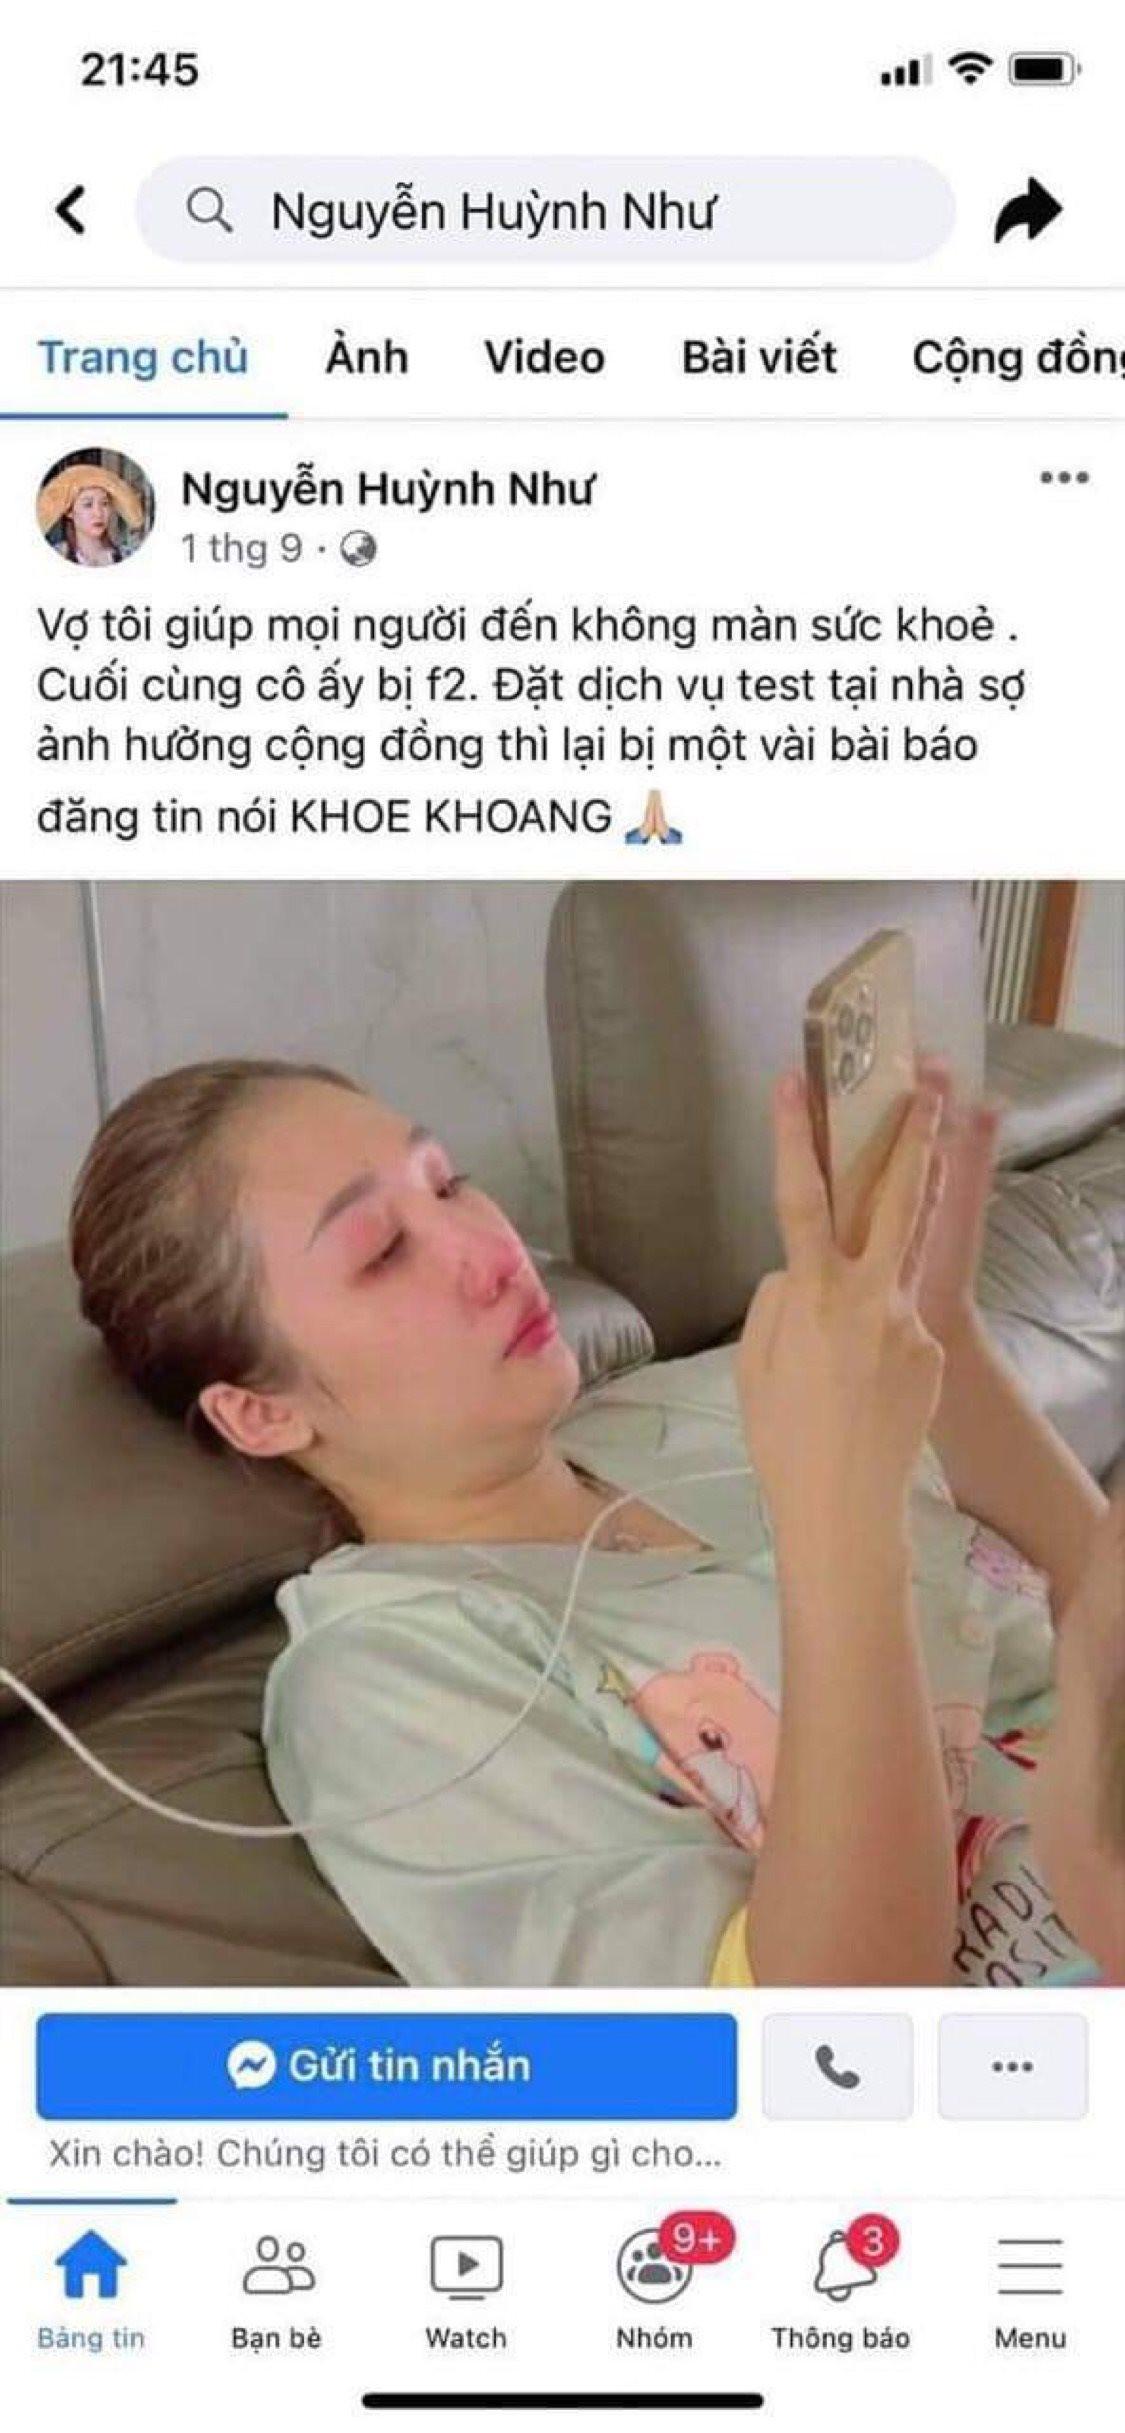 tren-trang-facebook-ca-nhan-cua-nu-doanh-nhan-con-dang-thong-tin-ba-nh-bi-f2-.jpg